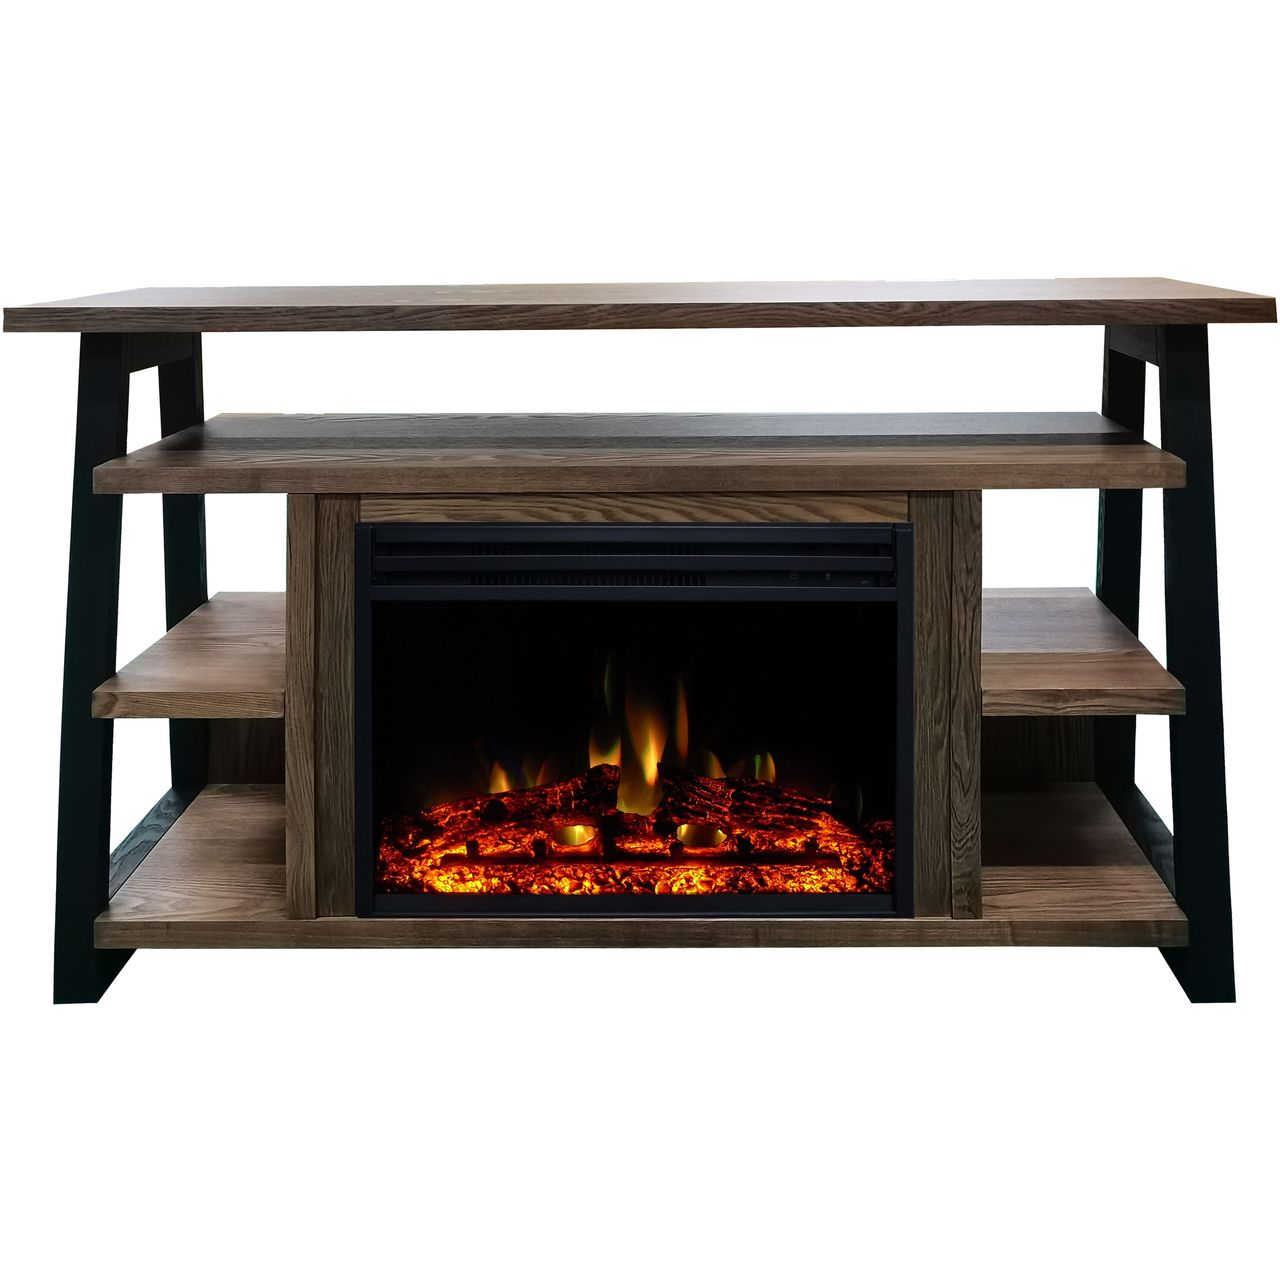 "Cambridge 32"" Sawyer Electric Fireplace Mantel/Enhanced Log - Walnut"